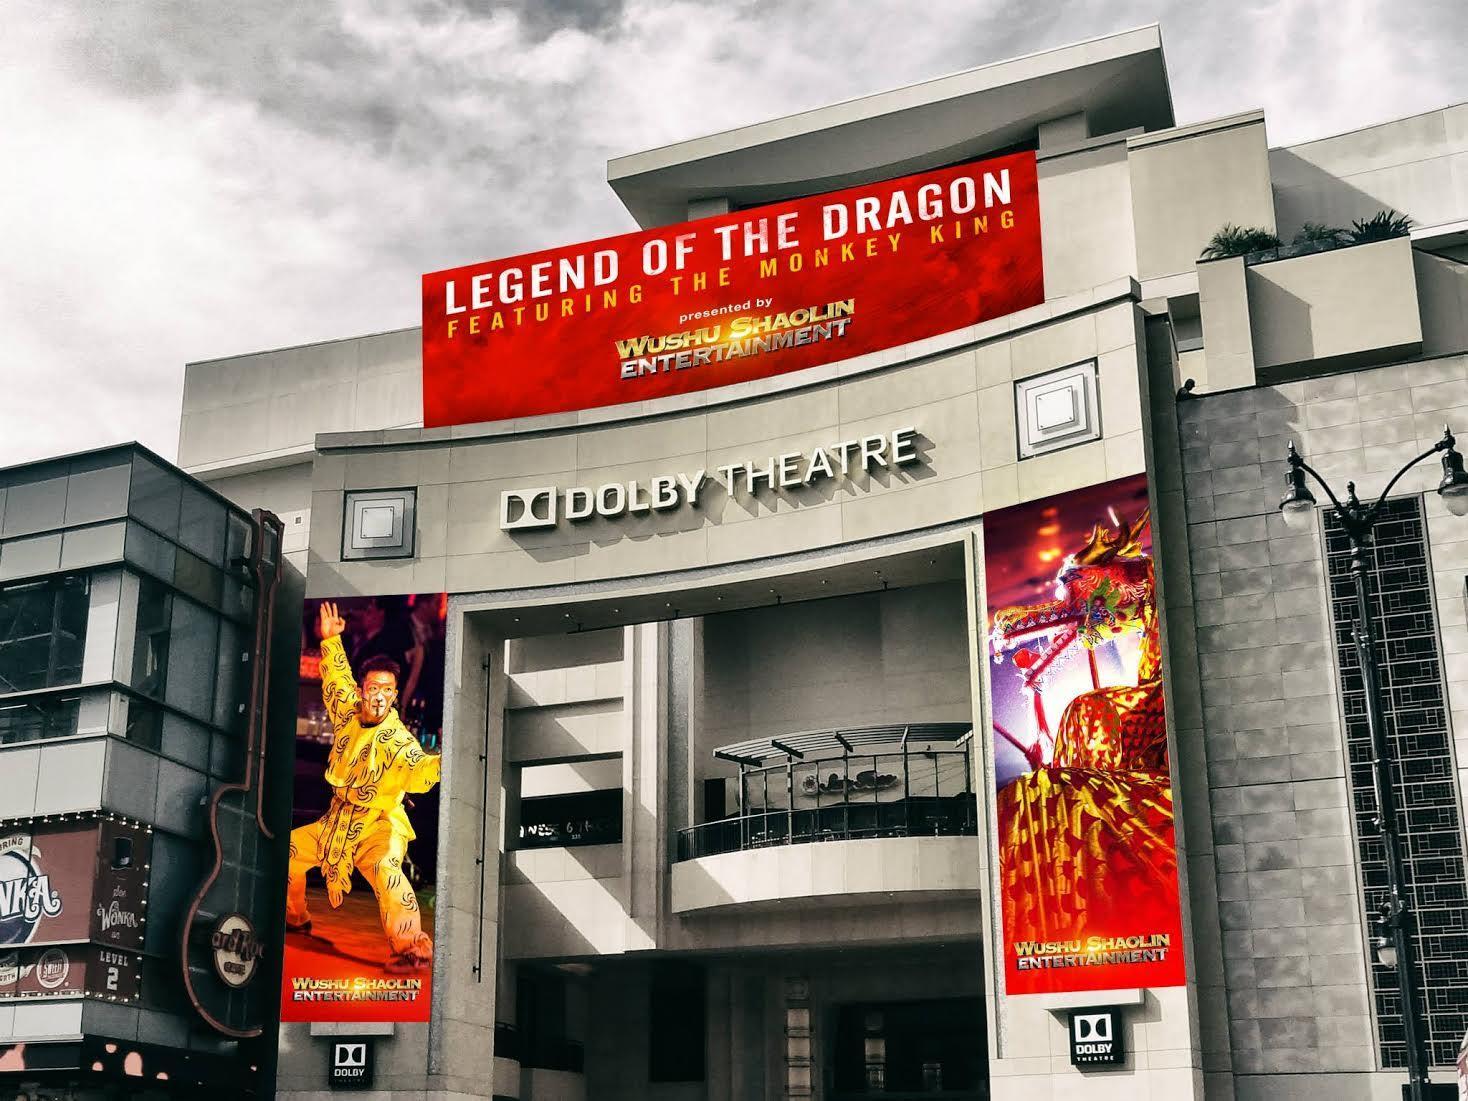 Legend of the Dragon - Live Dragon Dance Show